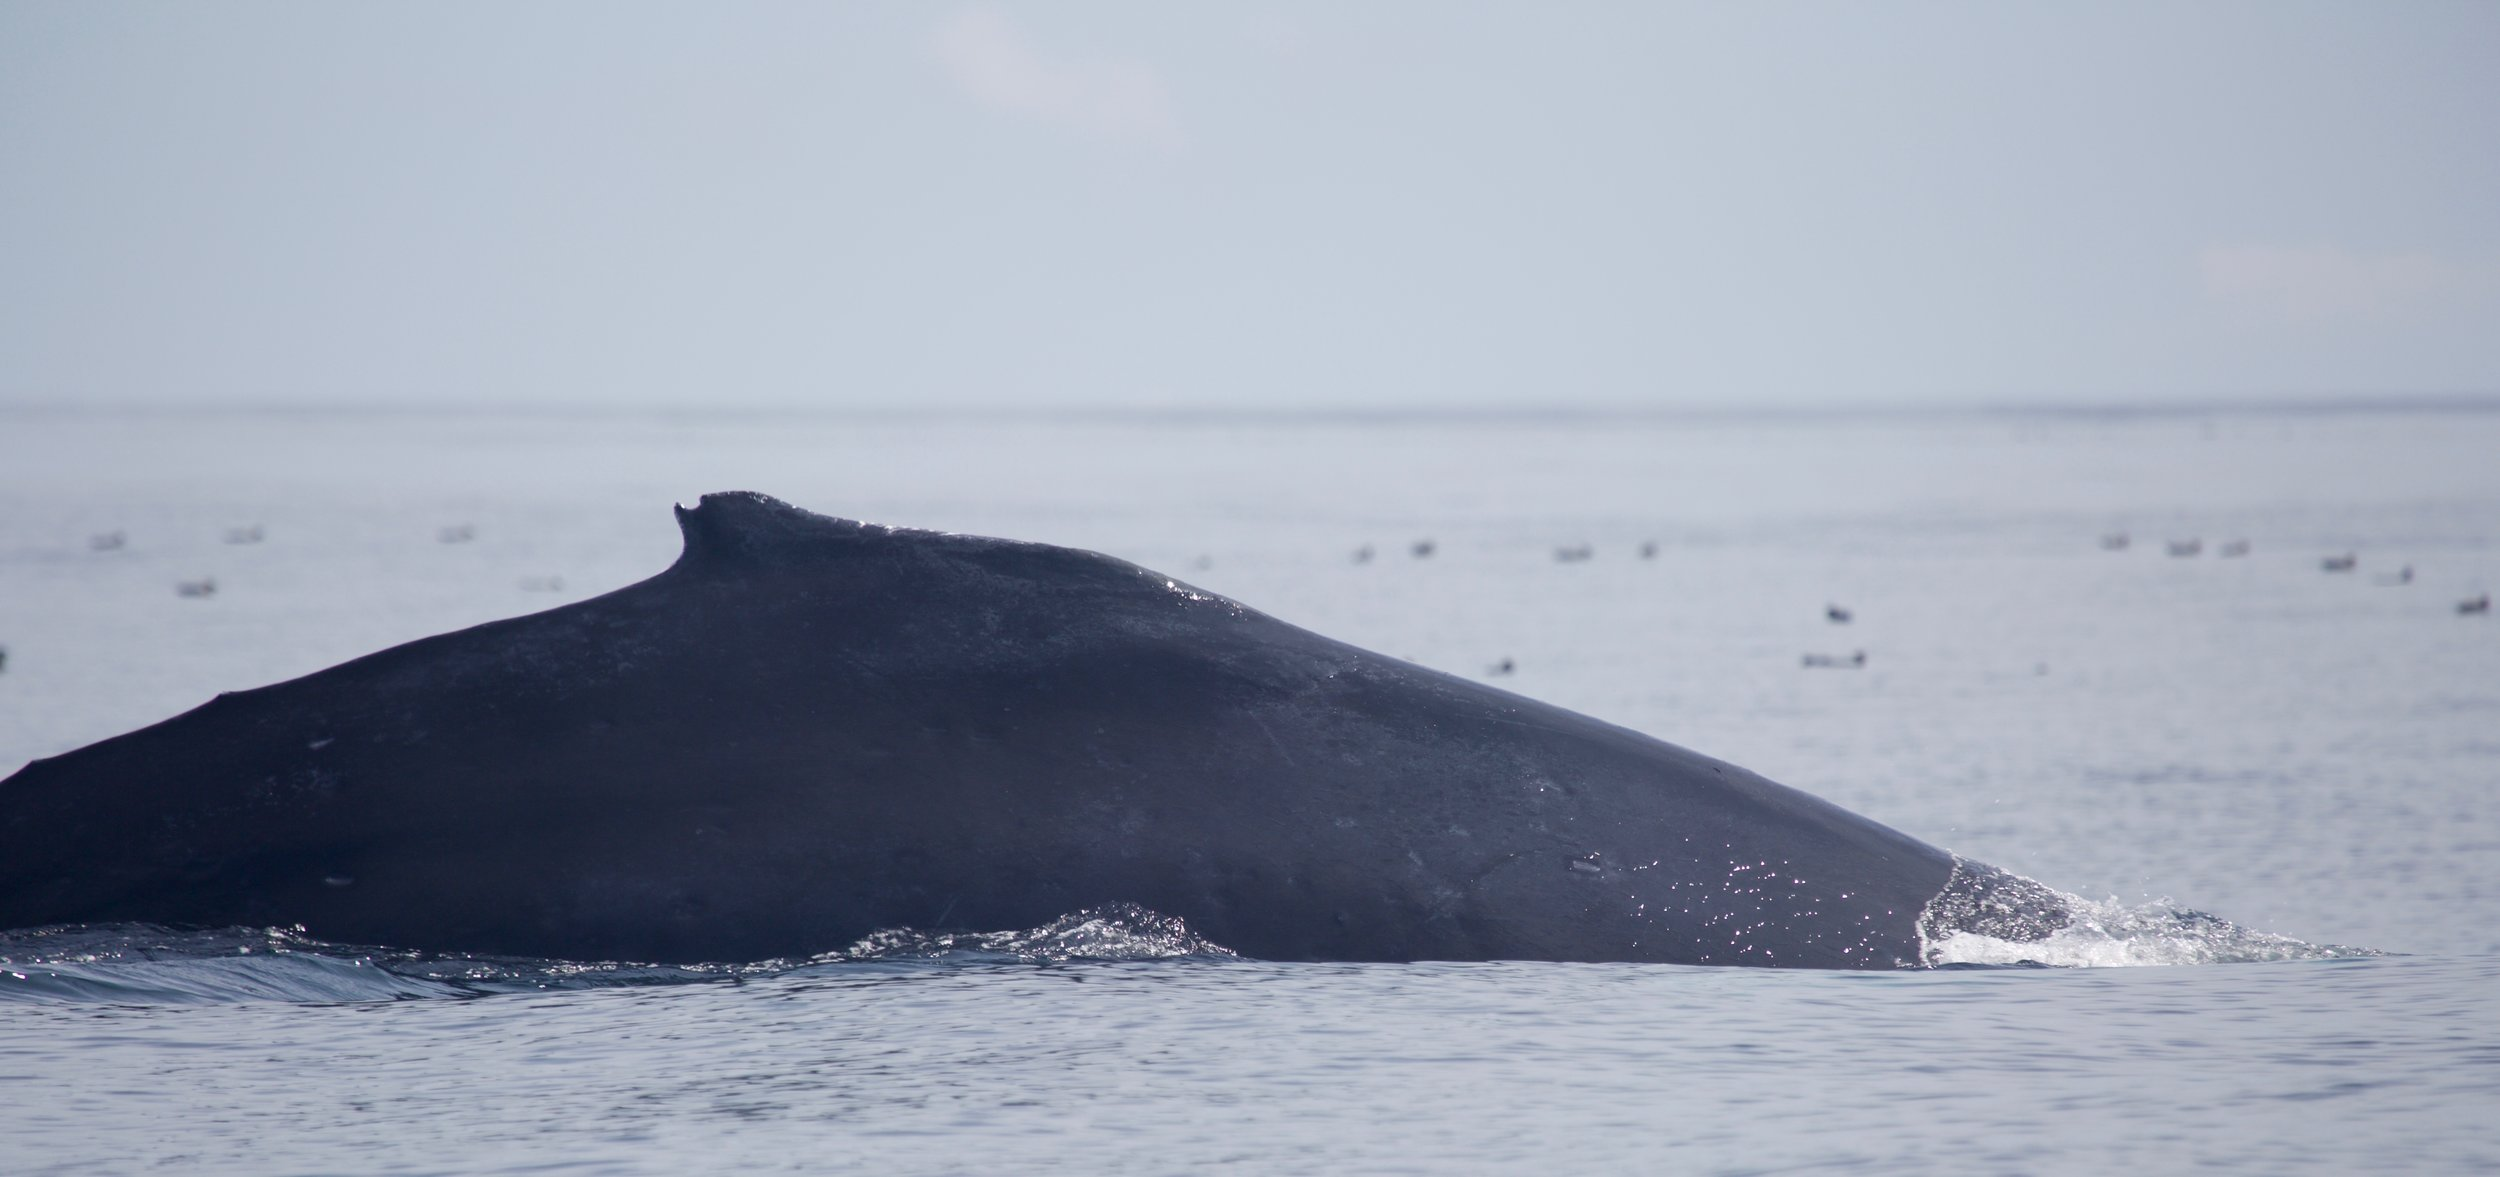 Humpback Whale, Tofino